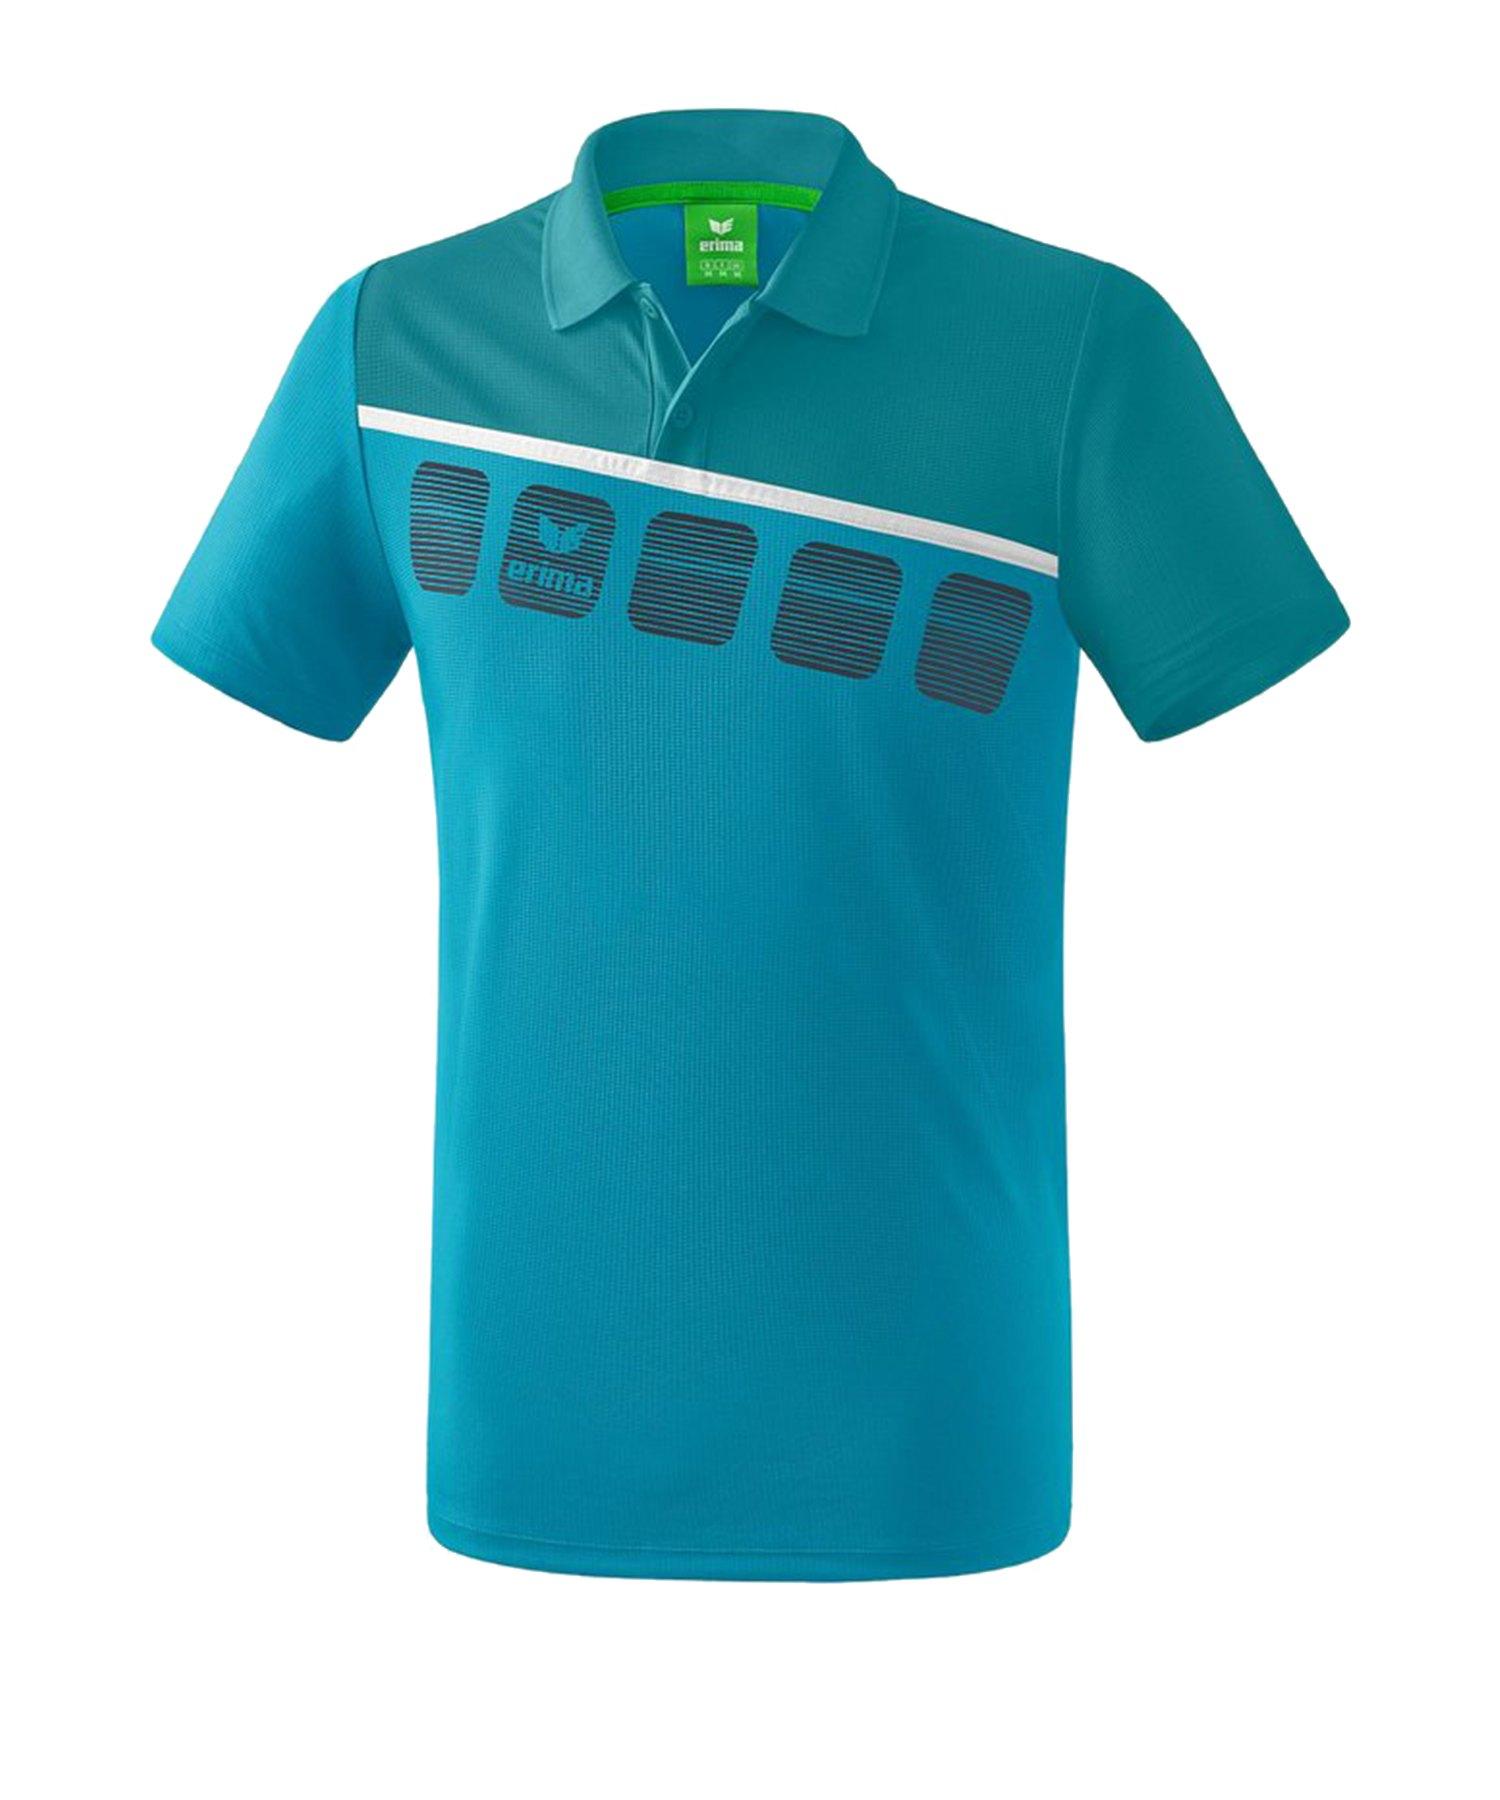 Erima 5-C Poloshirt Blau Weiss - Blau